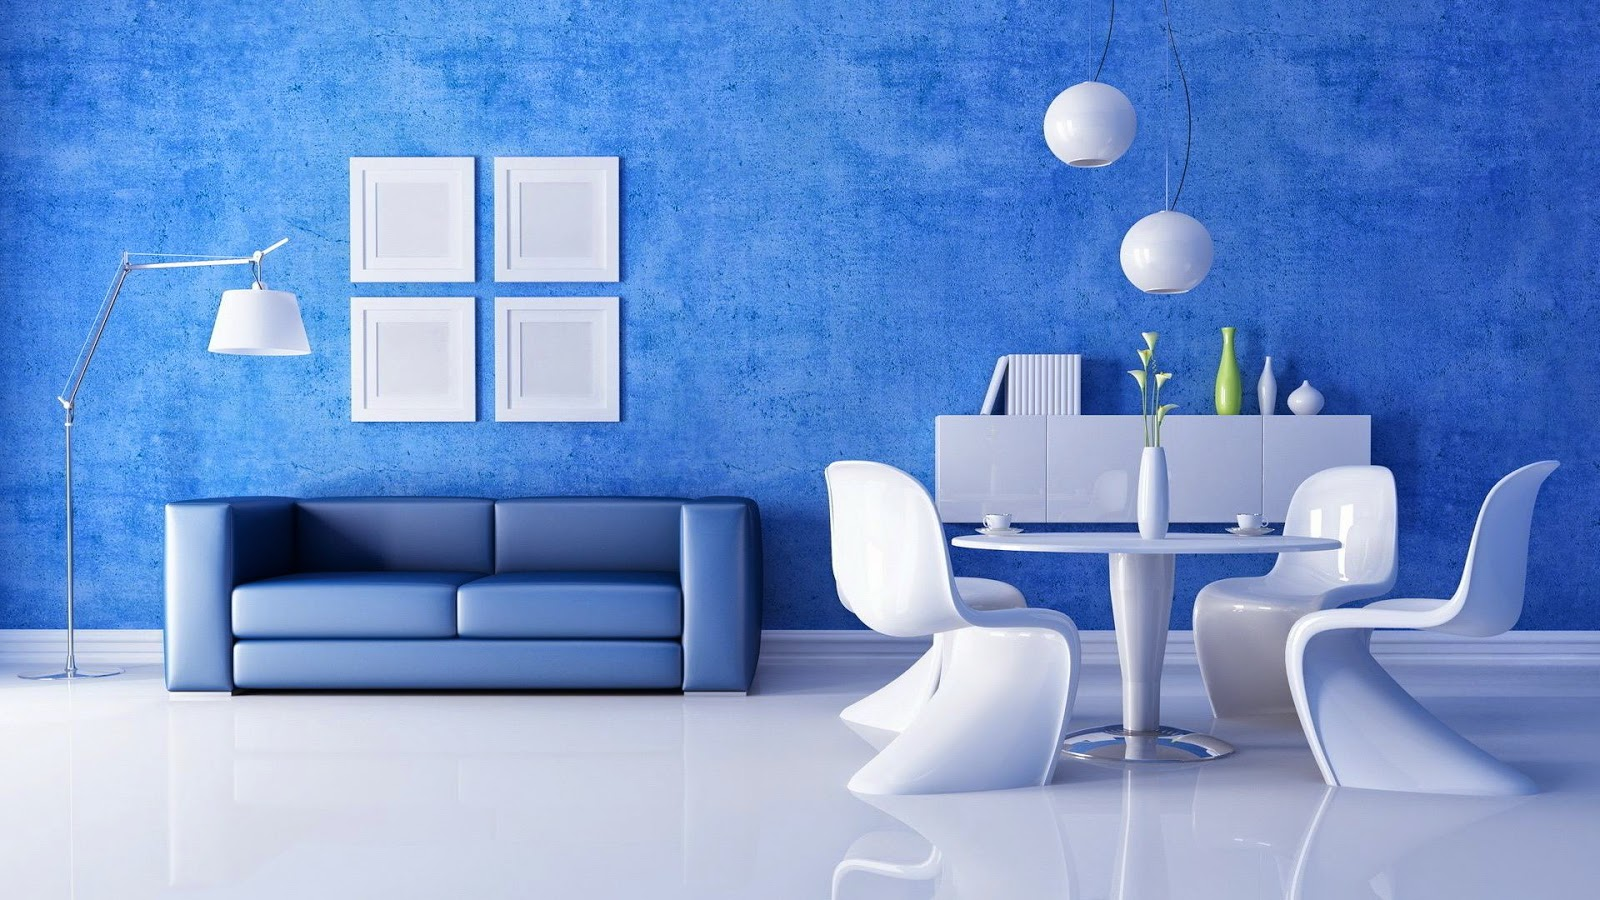 Interior Rumah Minimalis Warna Biru 6